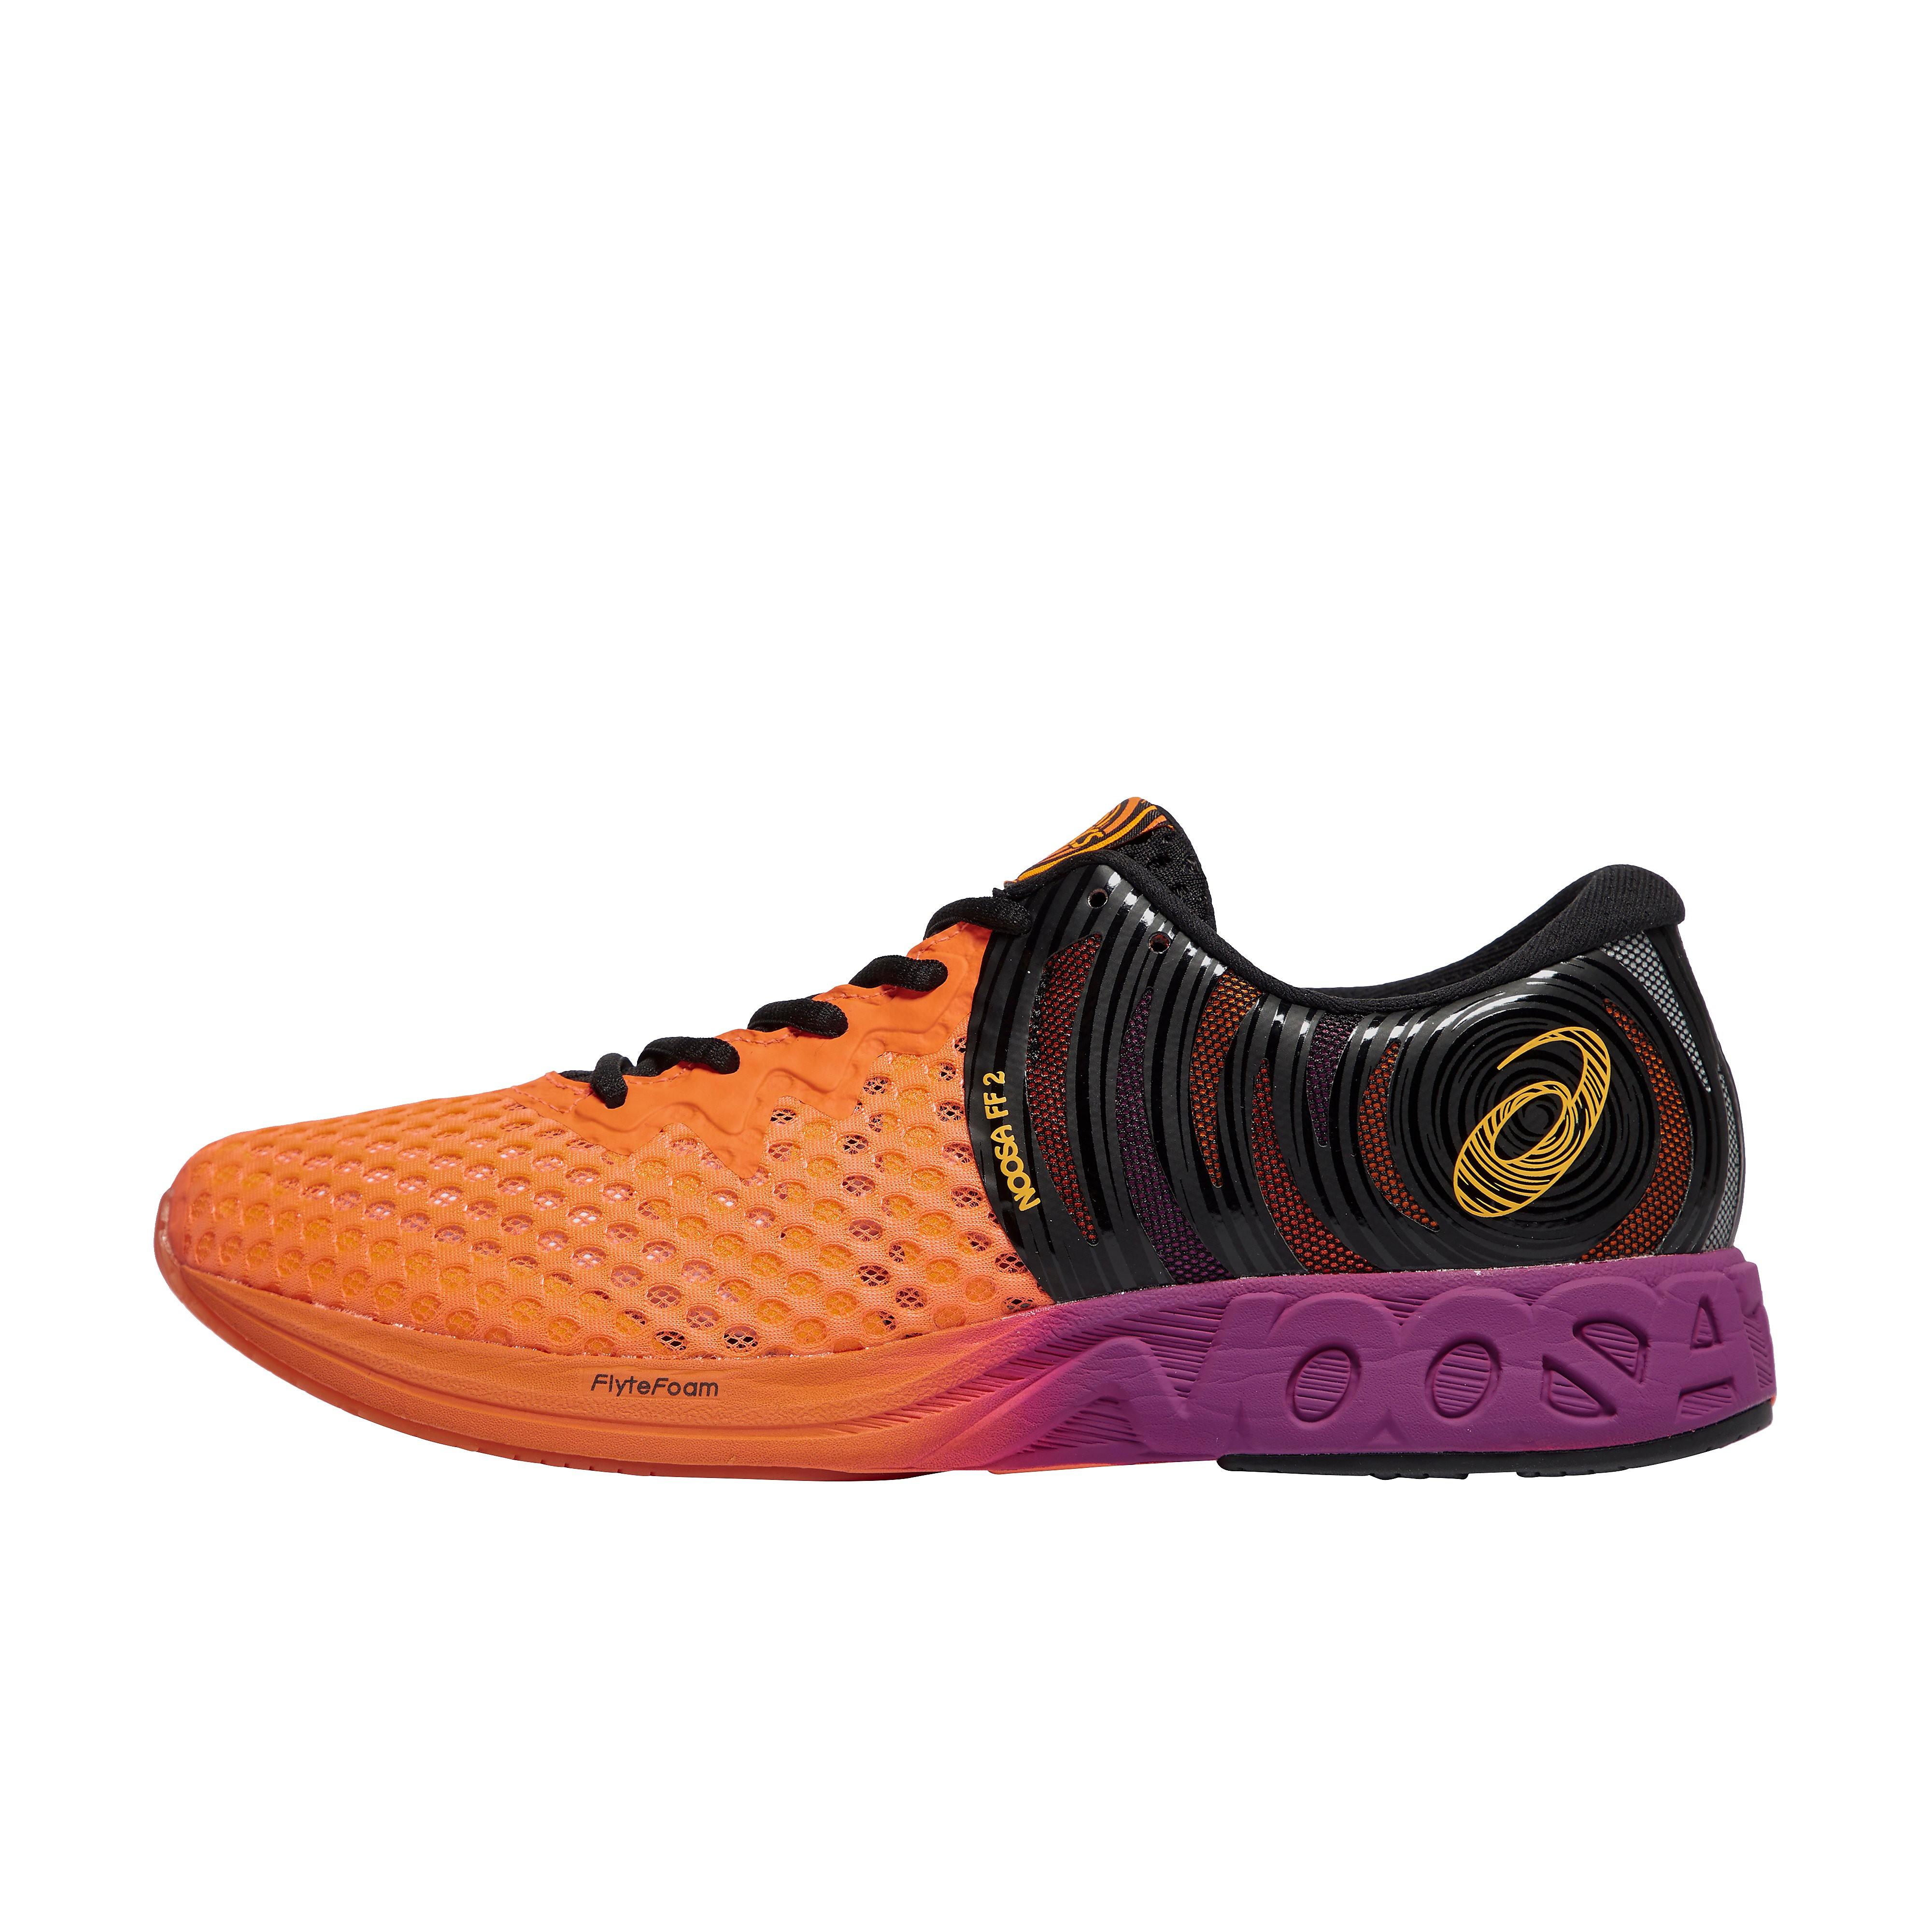 Men's ASICS Noosa flytefoam 2 Running Shoes - Coral, Coral